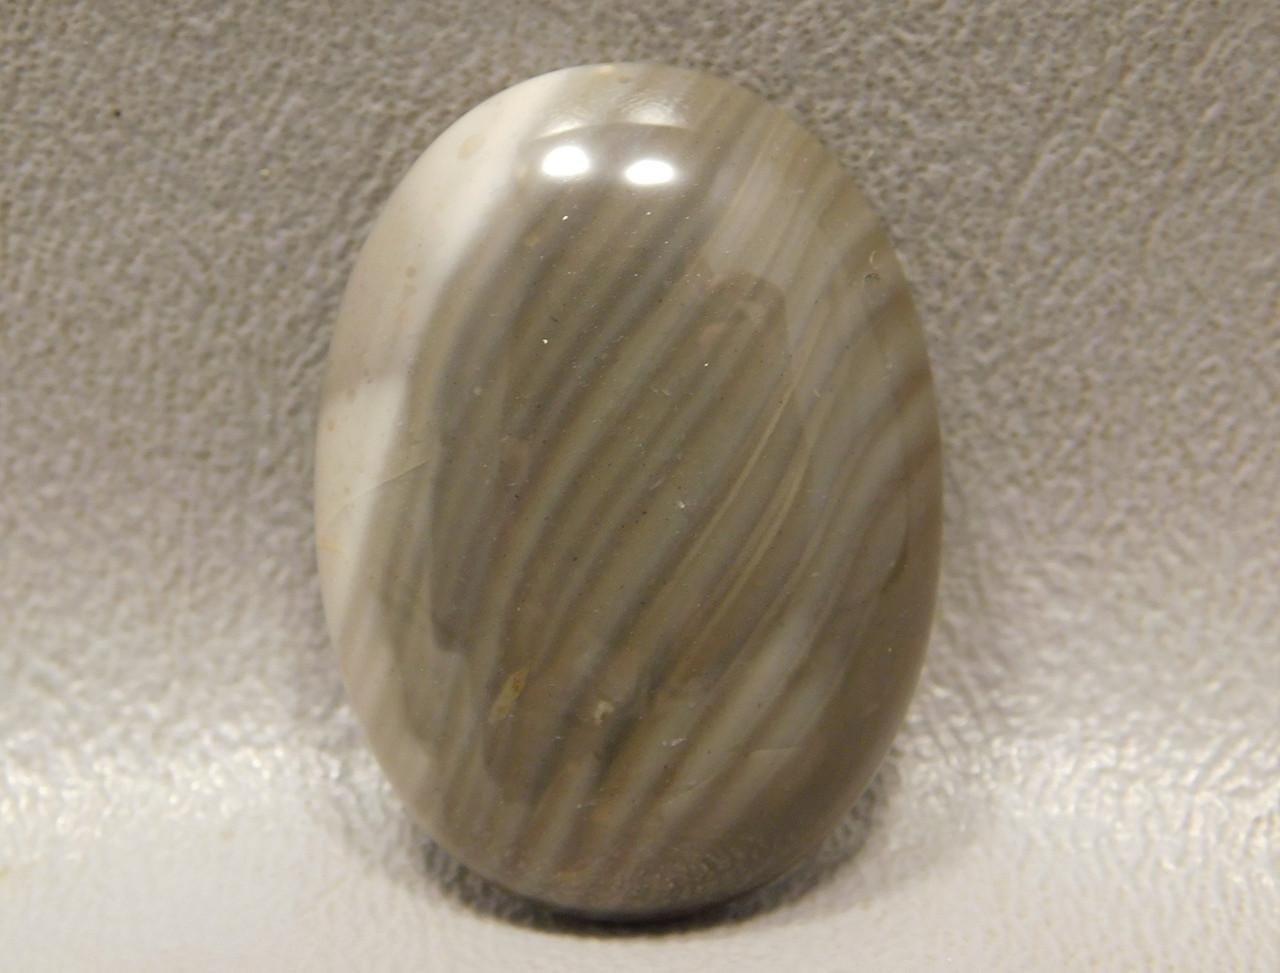 Cabochon Stone Banded Polish Flint Jewelry Making Supplies #16